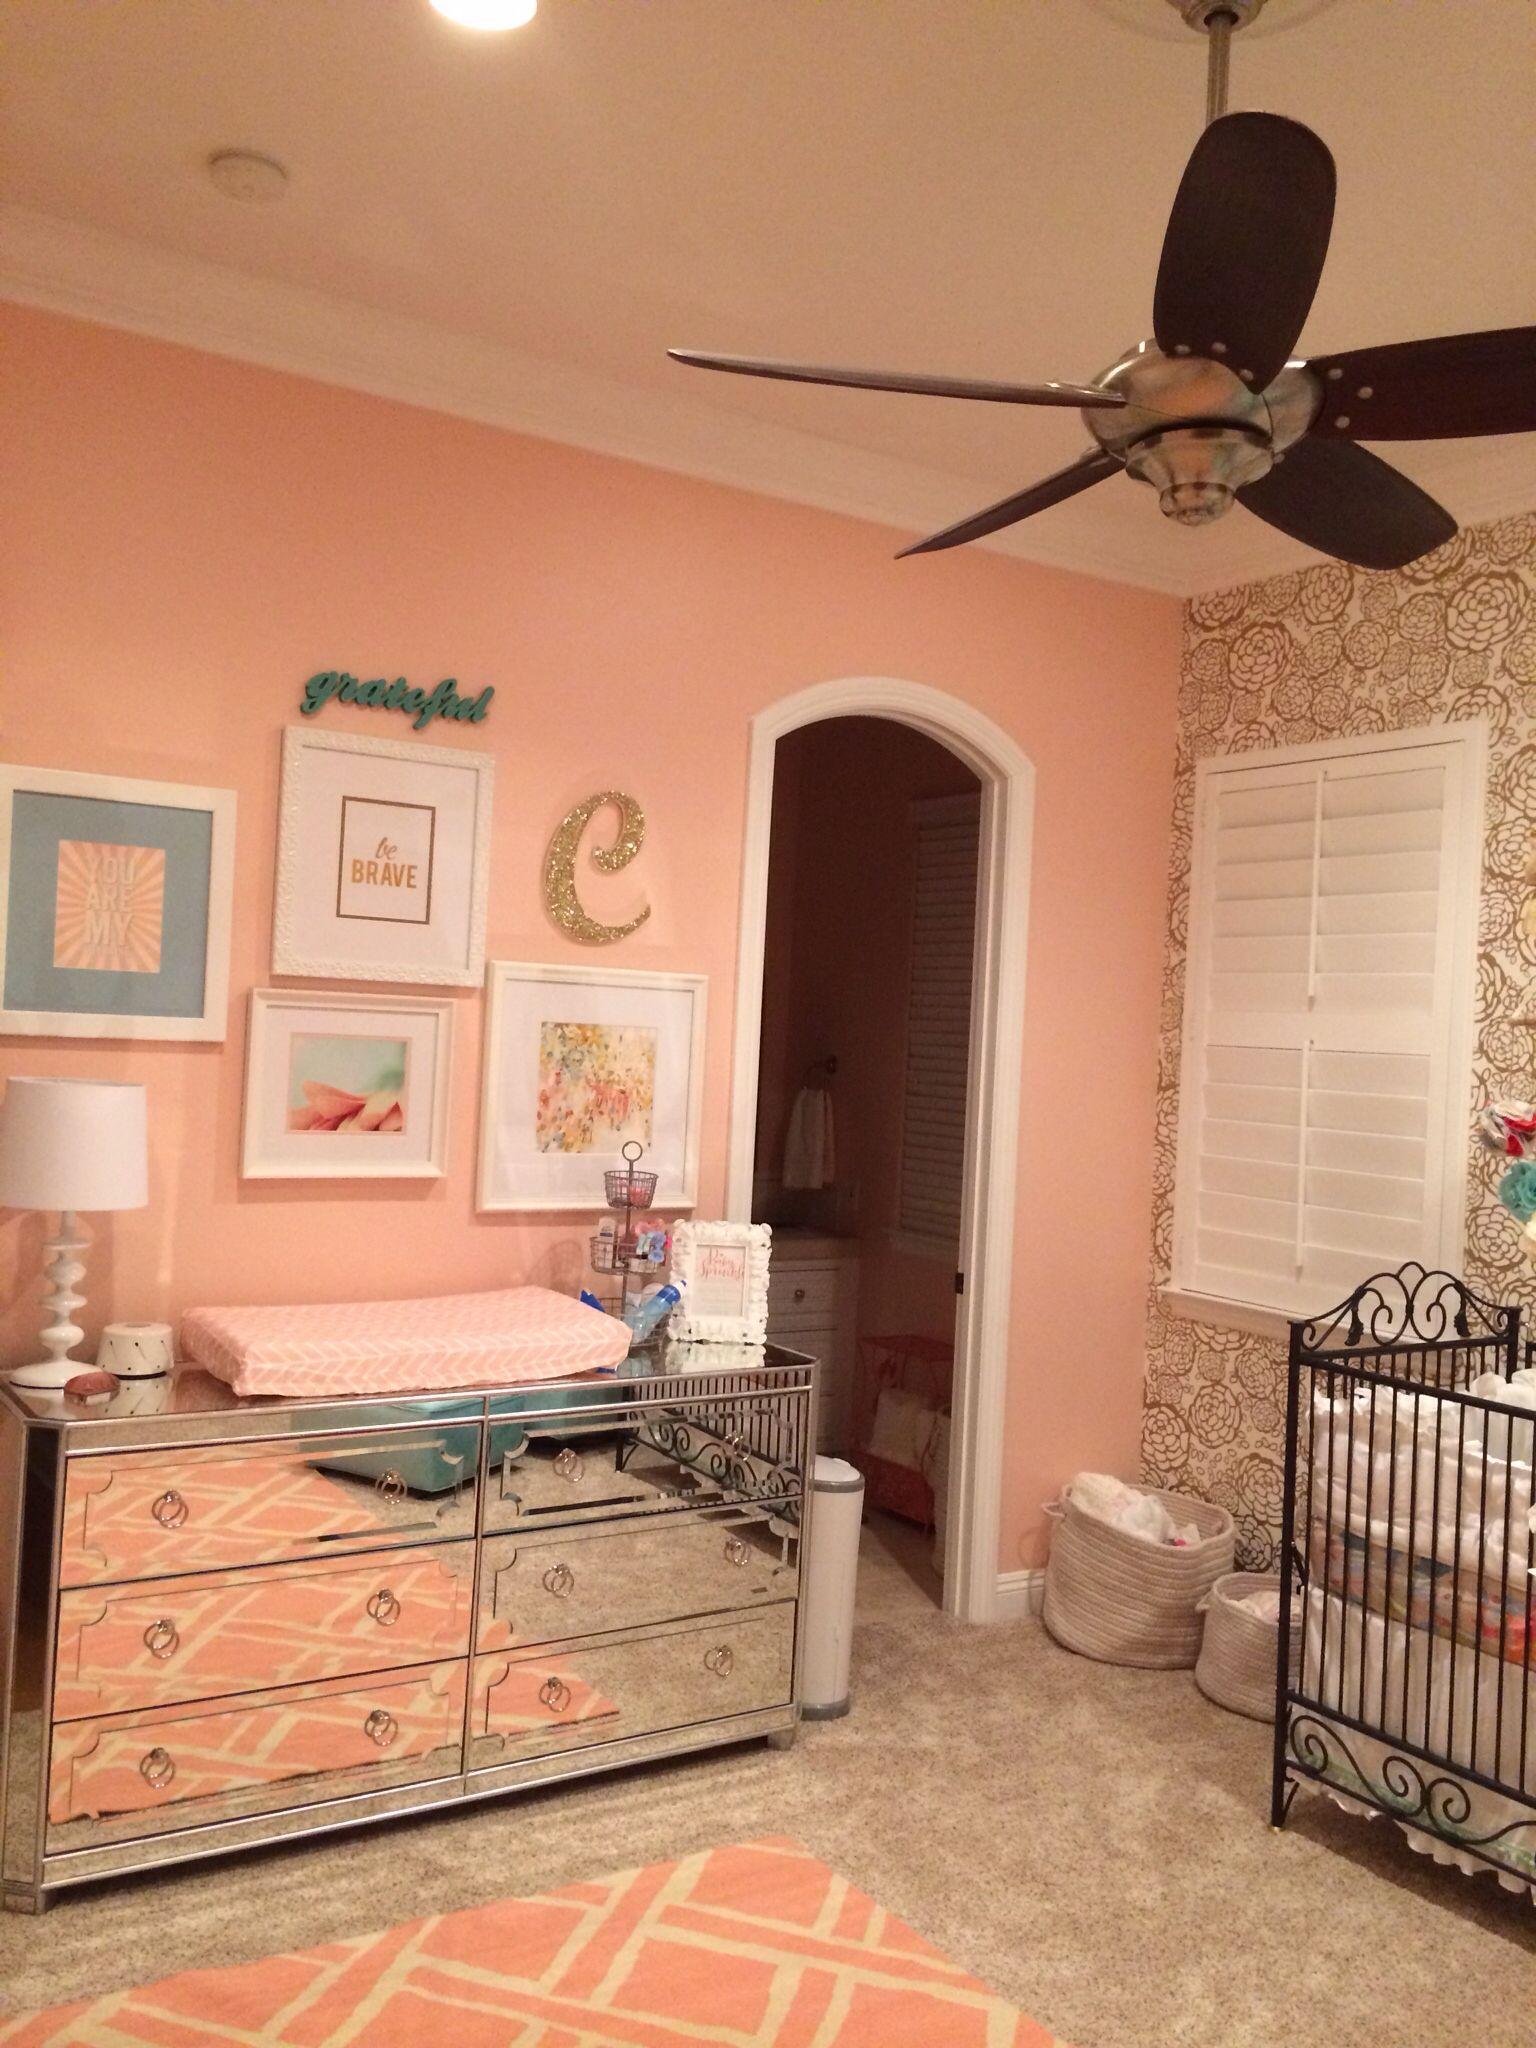 Nursery. Coral, gold, aqua, dresser z Gallerie Baby girl